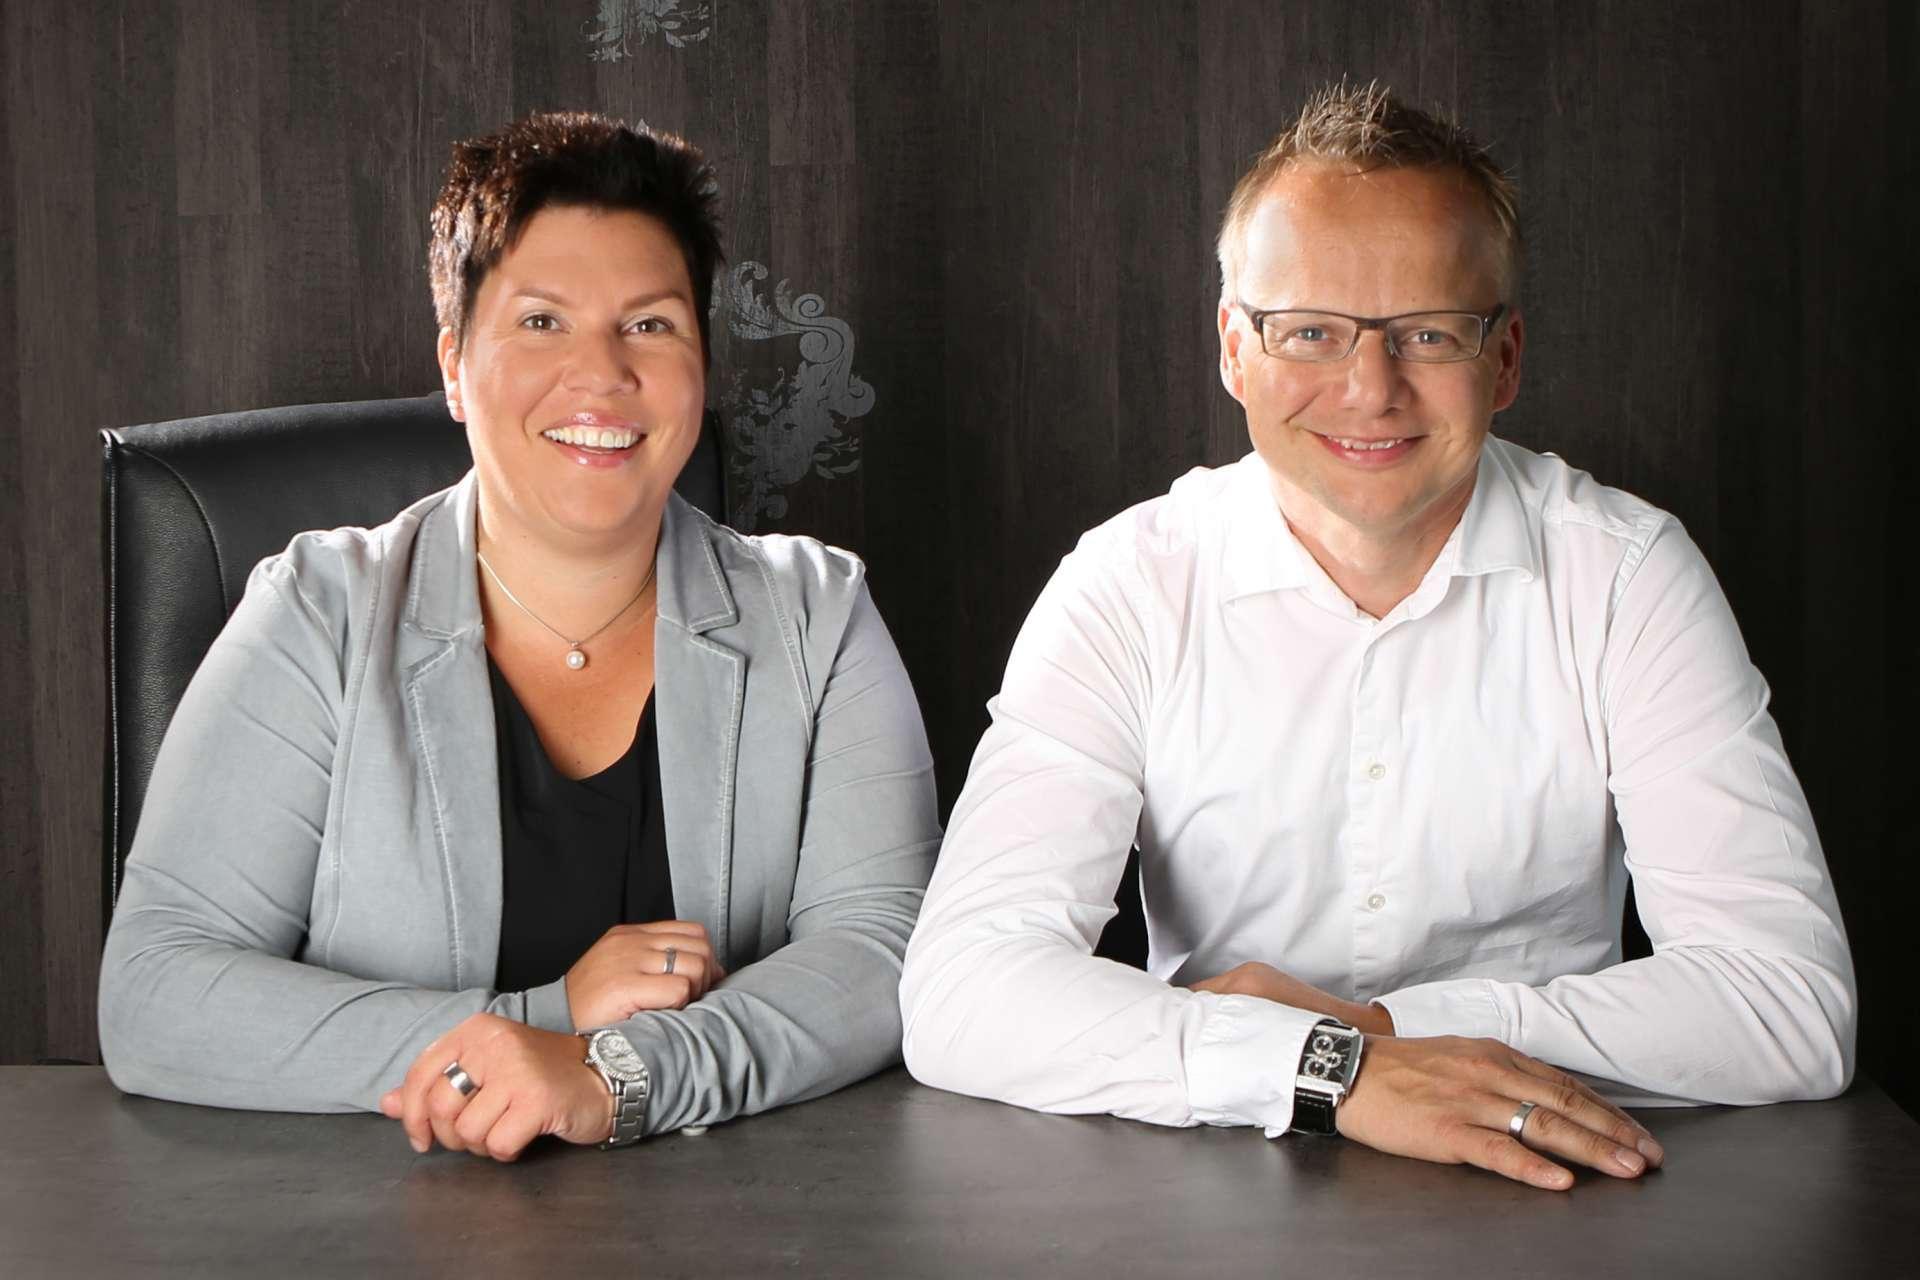 Malerbetrieb Reckersdrees: Sandra und Andre